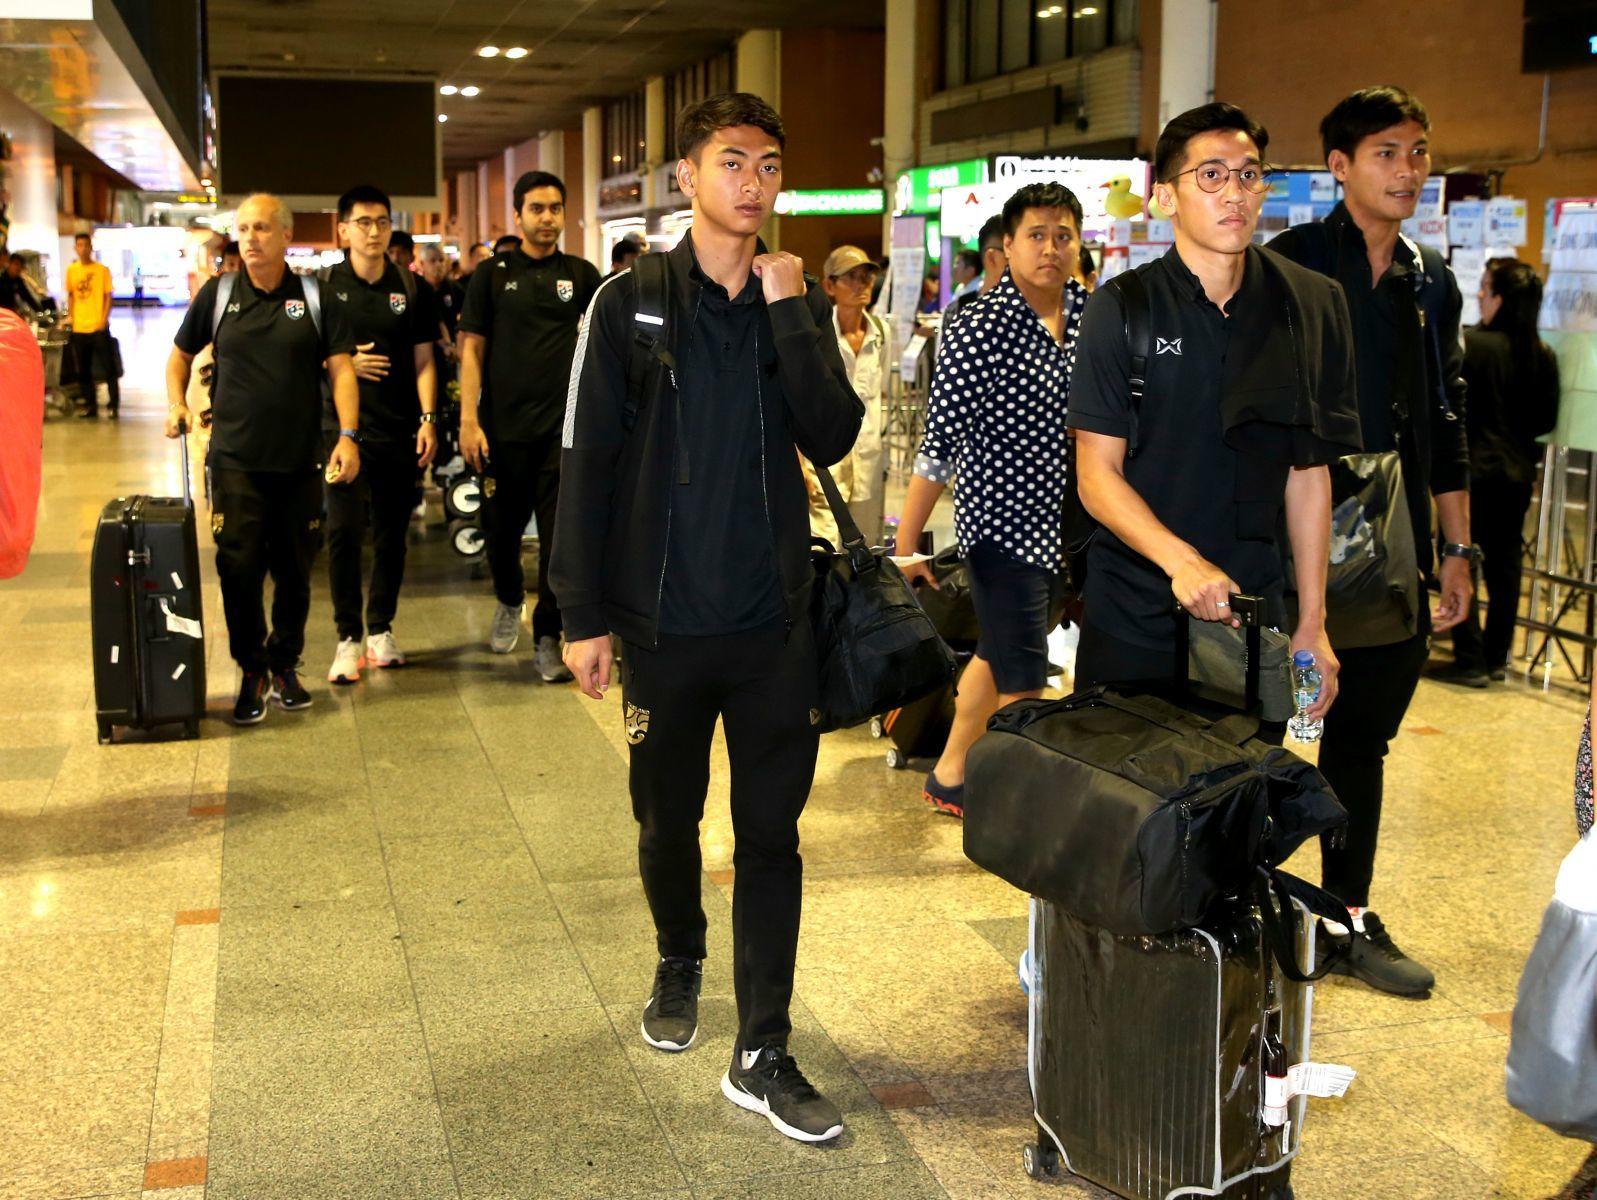 U23 Thái Lan,U23 Việt Nam